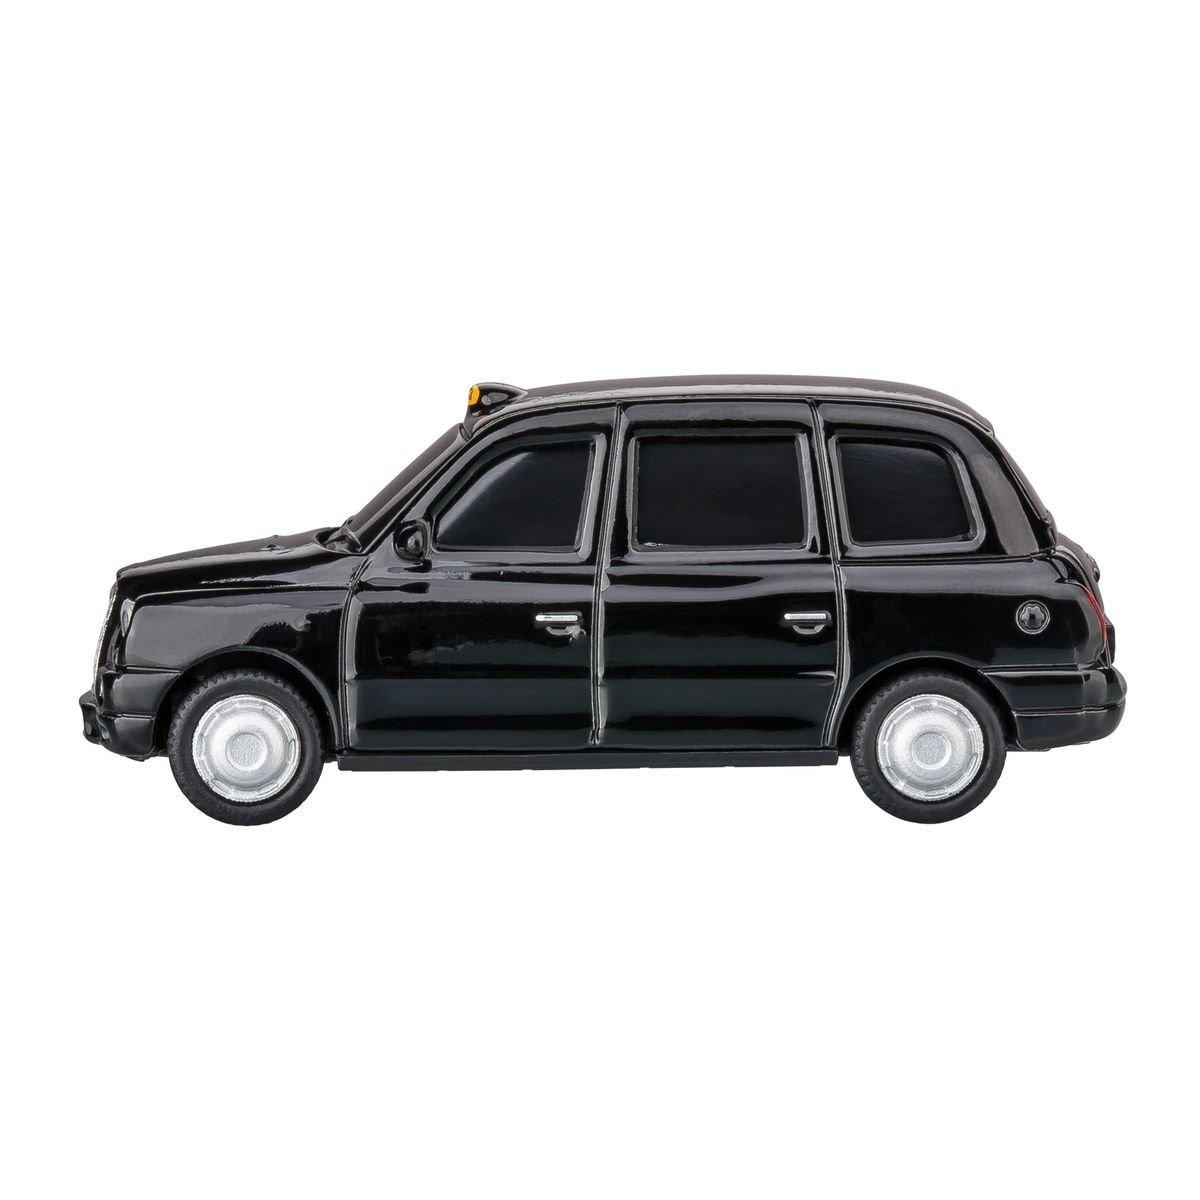 USB-Speicherstick London Taxi TX4 1:72 BLACK 16GB, Ansicht 2